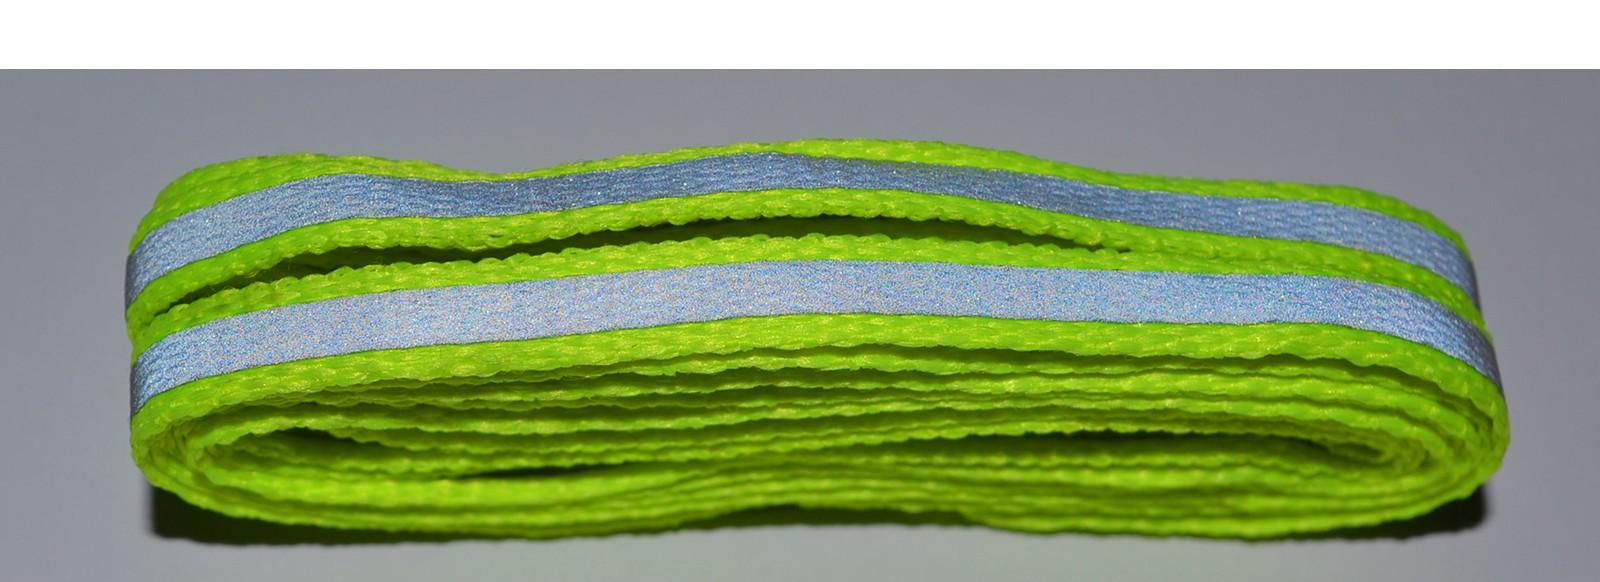 Flo Yellow Flat Reflective Laces